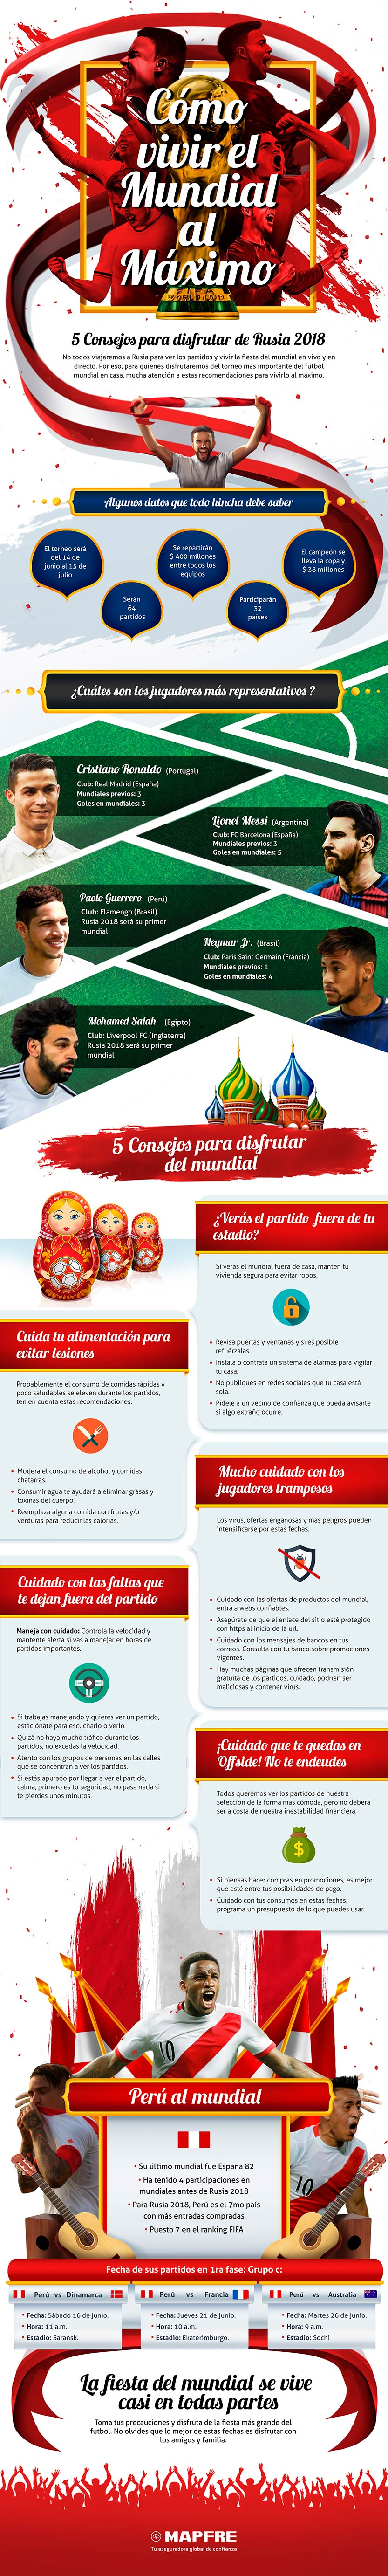 Infografía: Tips para vivir el Mundial de Rusia al máximo 2